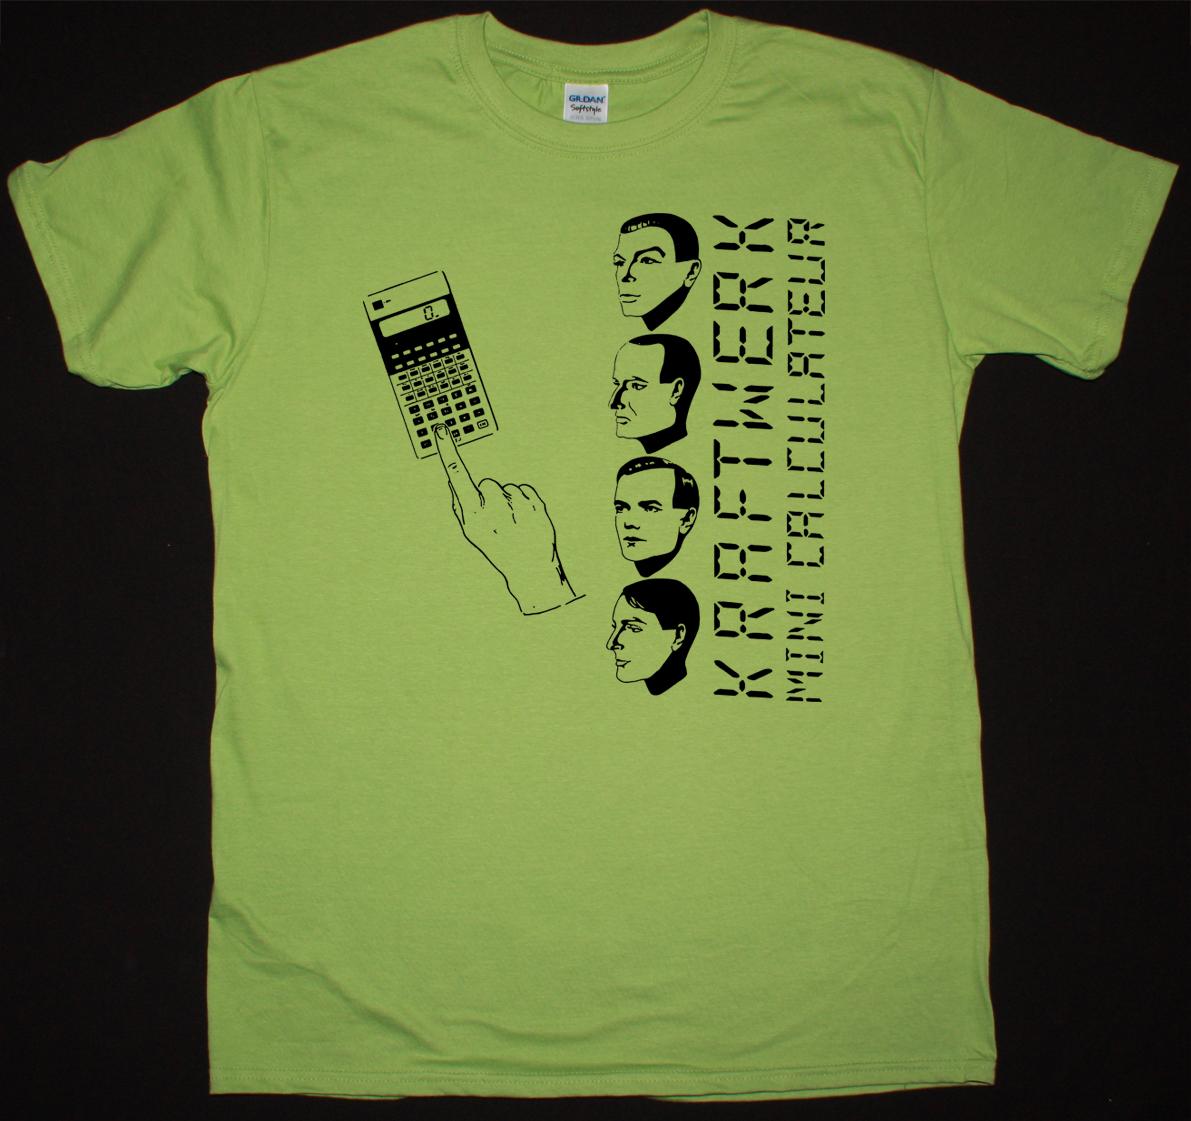 kraftwerk mini calculateur electro pop krautrock new green kiwi color t shirt best rock t shirts. Black Bedroom Furniture Sets. Home Design Ideas